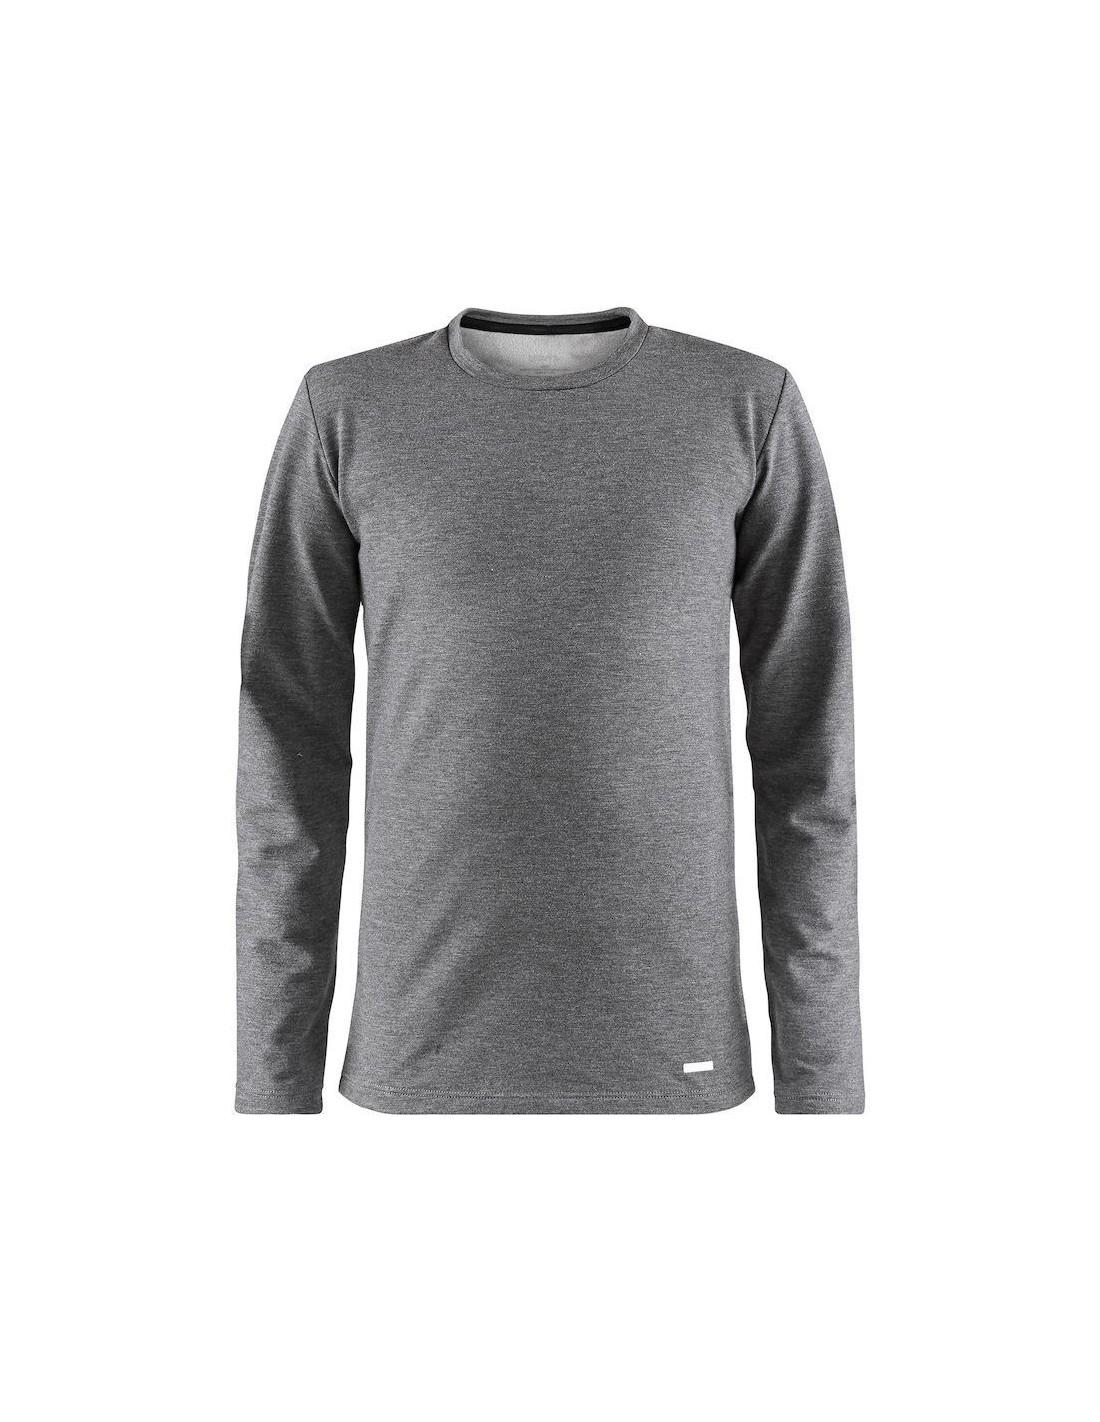 e45bb1094b9796 Koszulka termoaktywna dziecięca Craft Essential Warm RN LS, szara ...